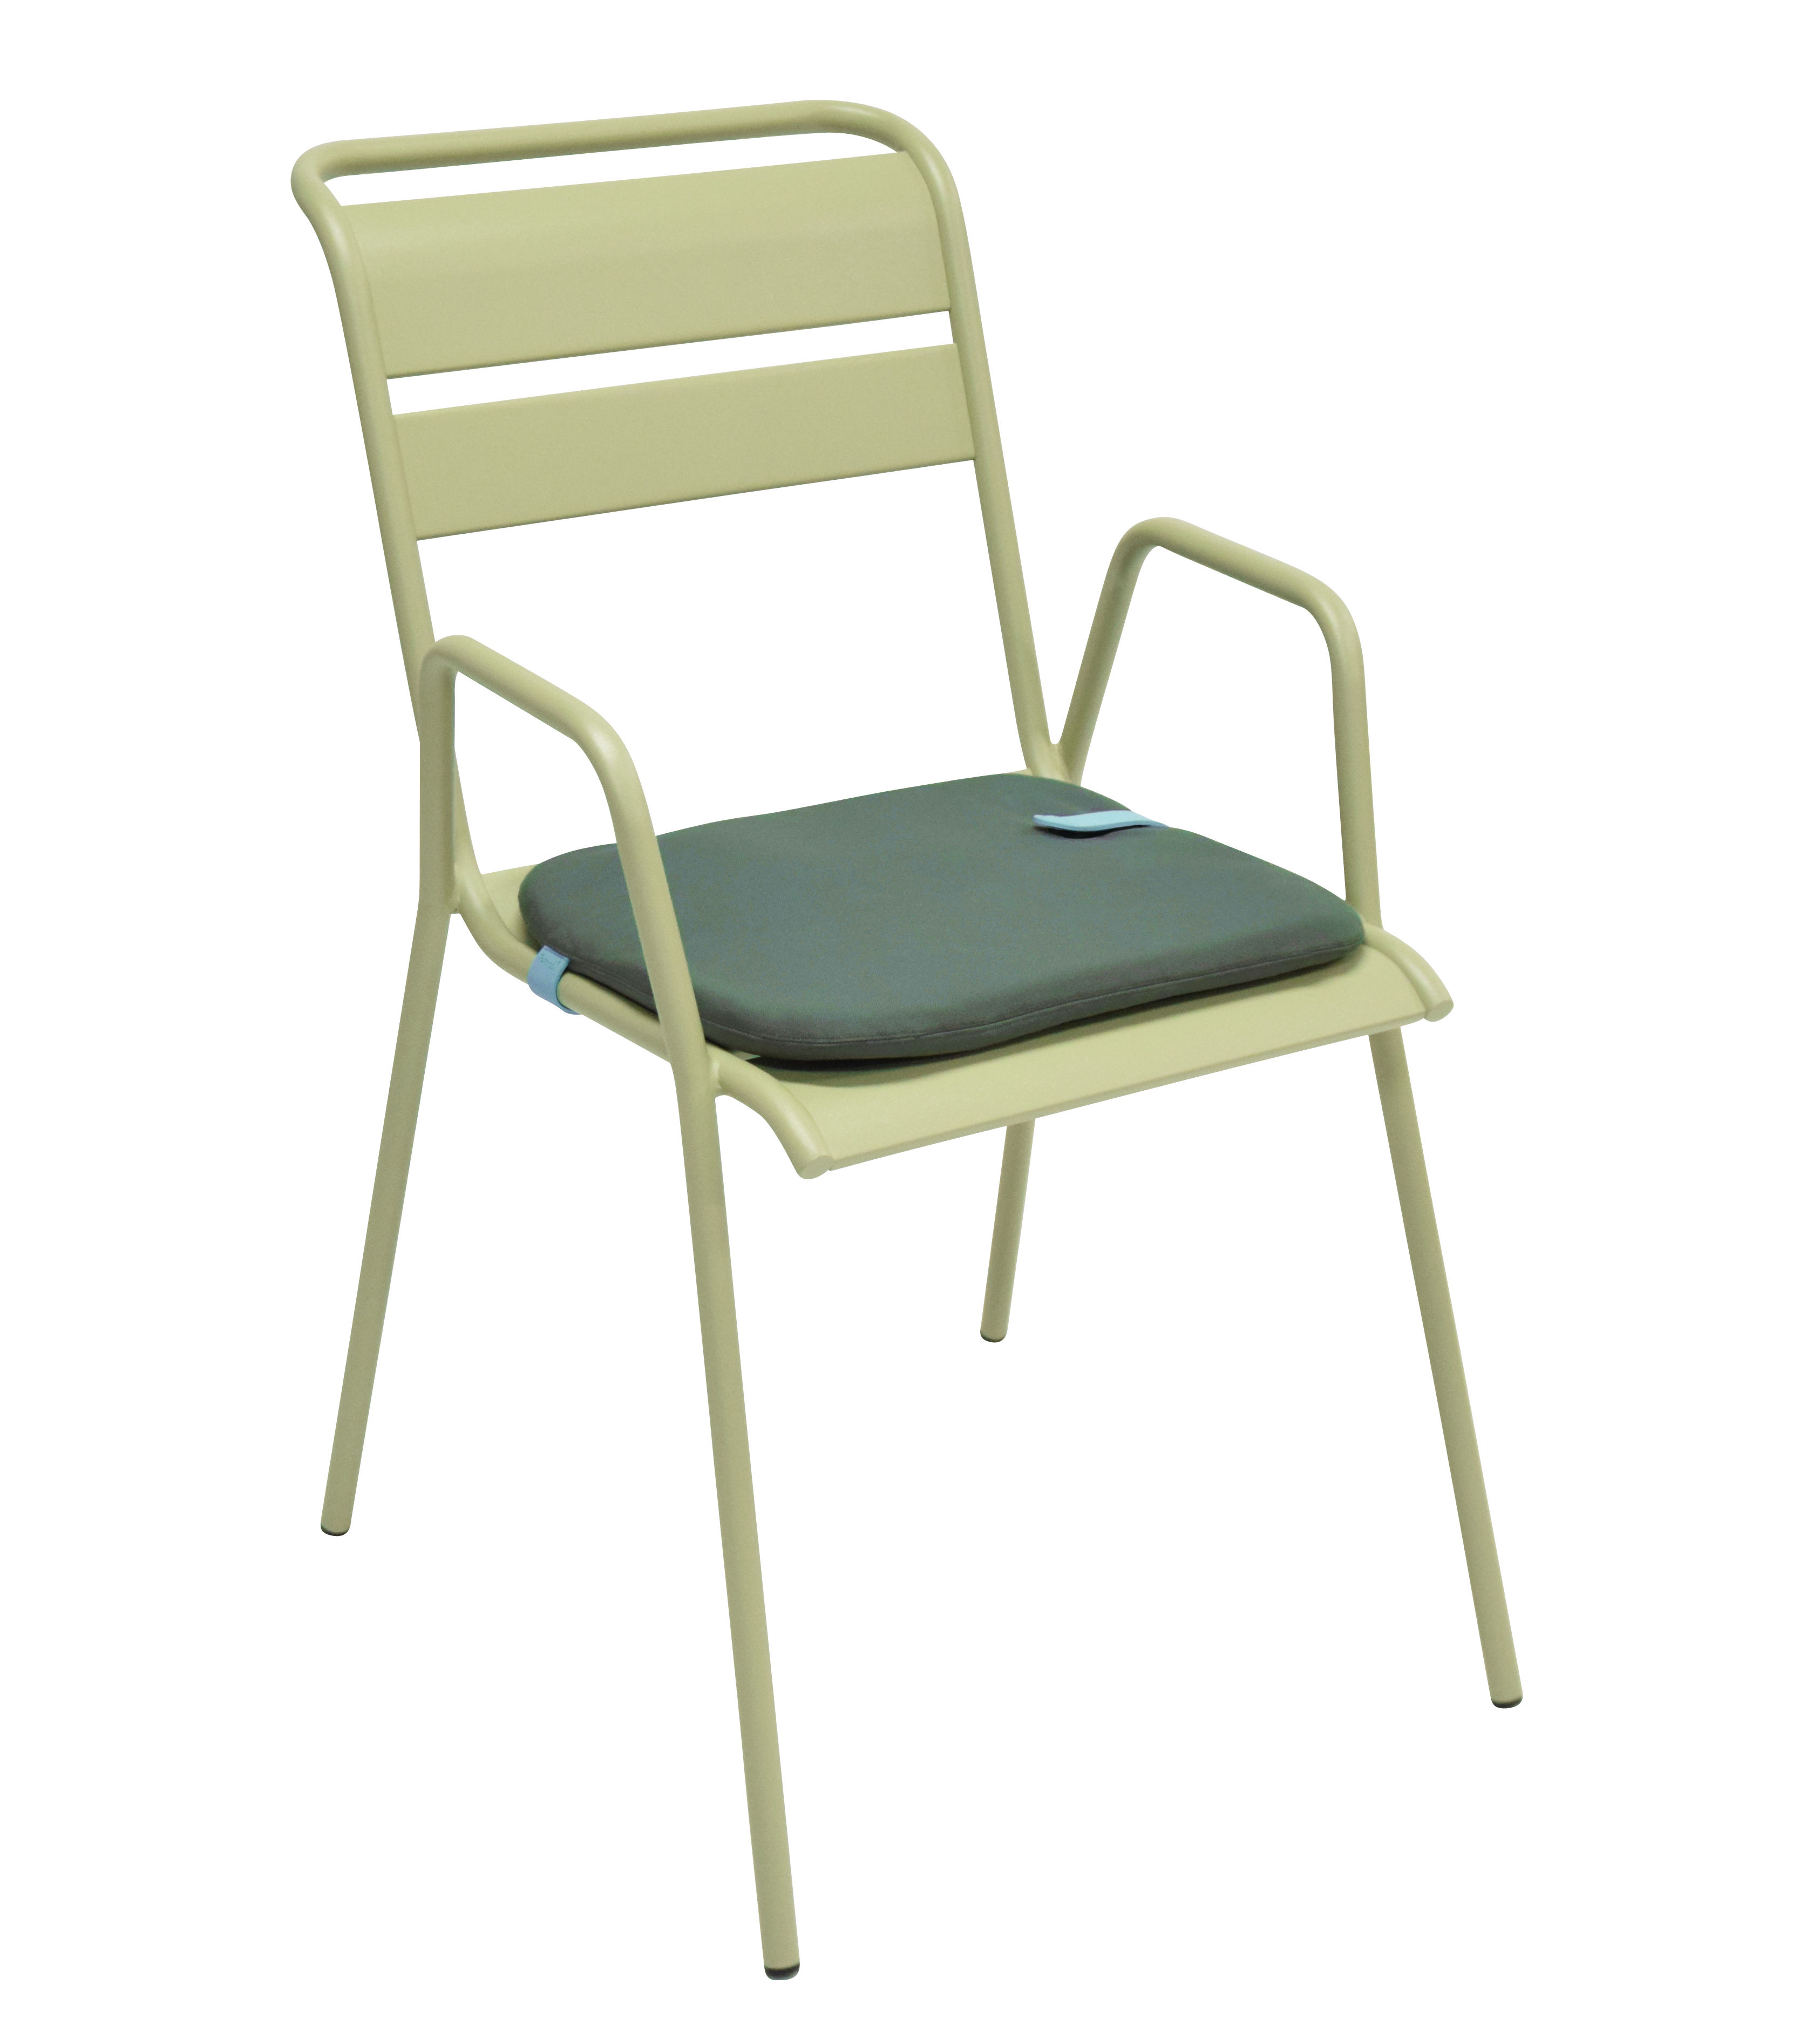 galette de chaise color mix 41 x 38 cm bleu goa sangle miel fermob made in design. Black Bedroom Furniture Sets. Home Design Ideas